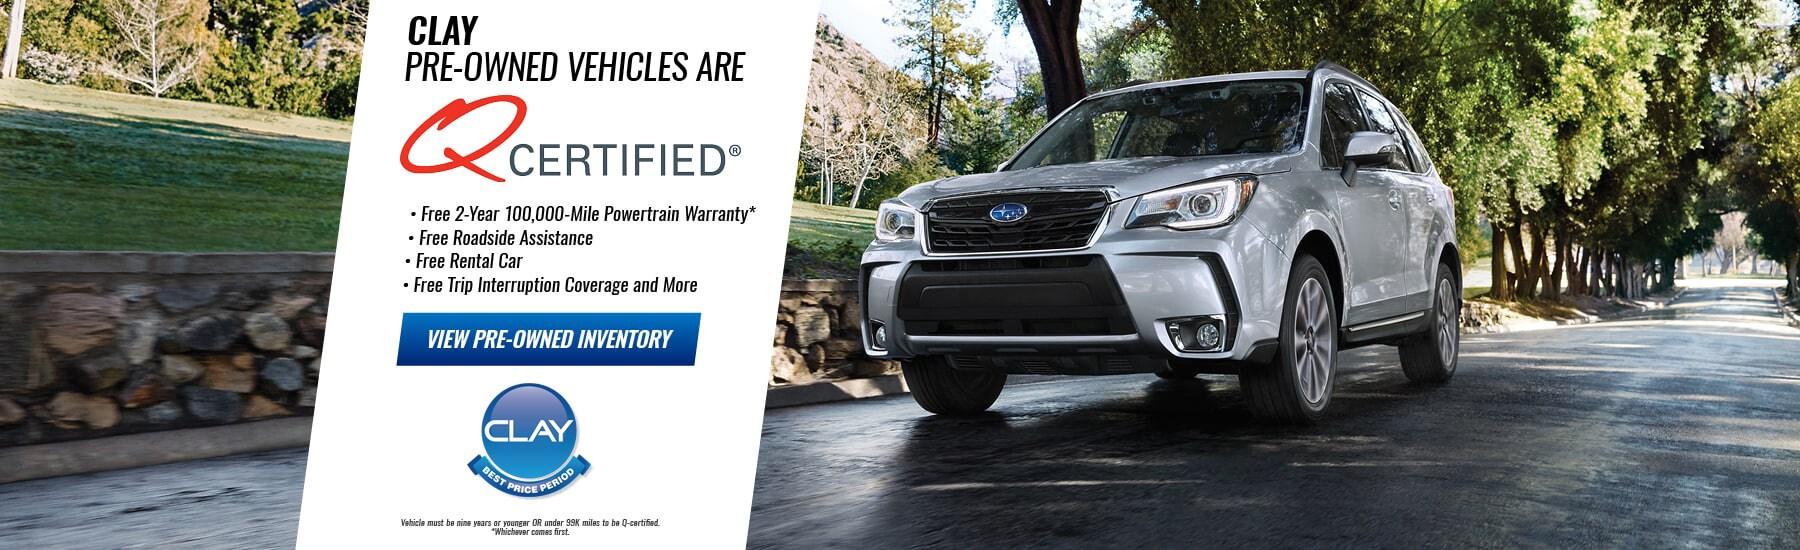 Subaru Dealers Ma >> Norwood S Clay Subaru Norwood Ma New And Used Subaru Cars Near